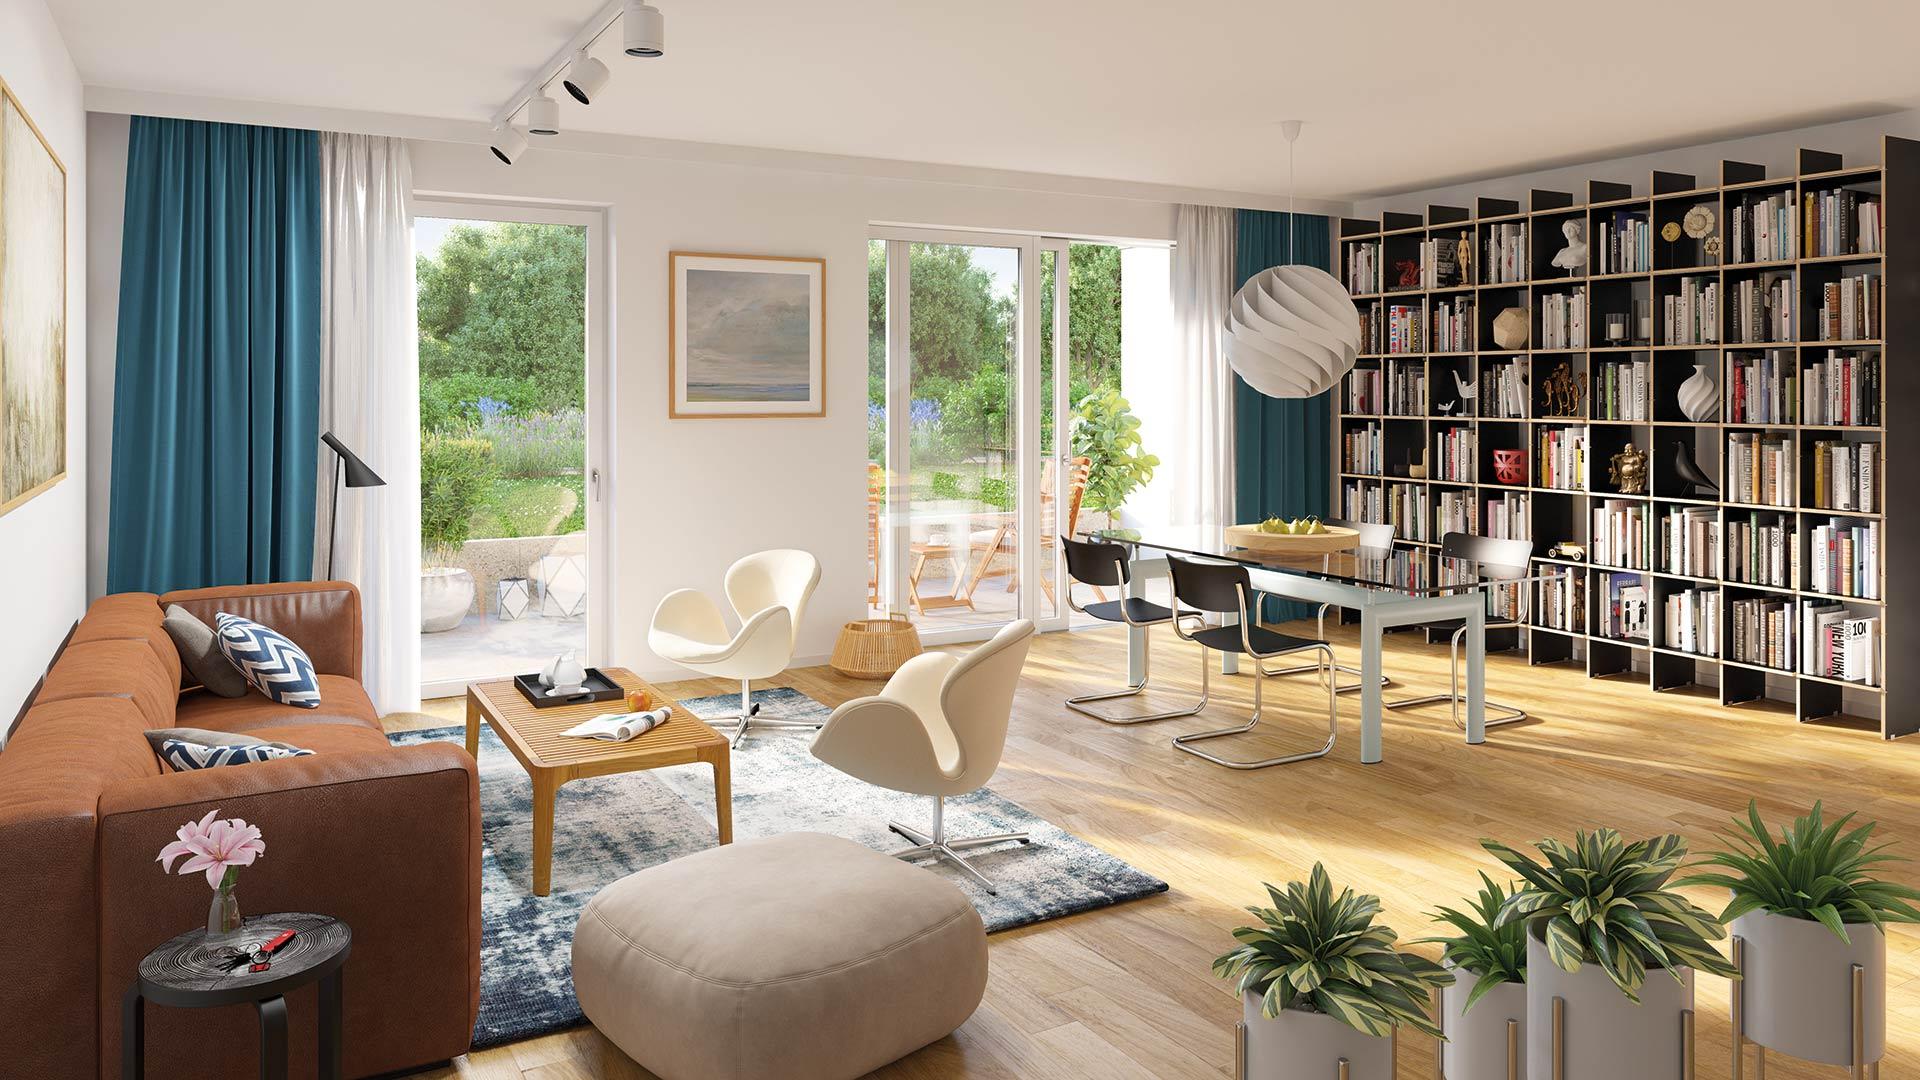 viva werder michael schade immobilien. Black Bedroom Furniture Sets. Home Design Ideas